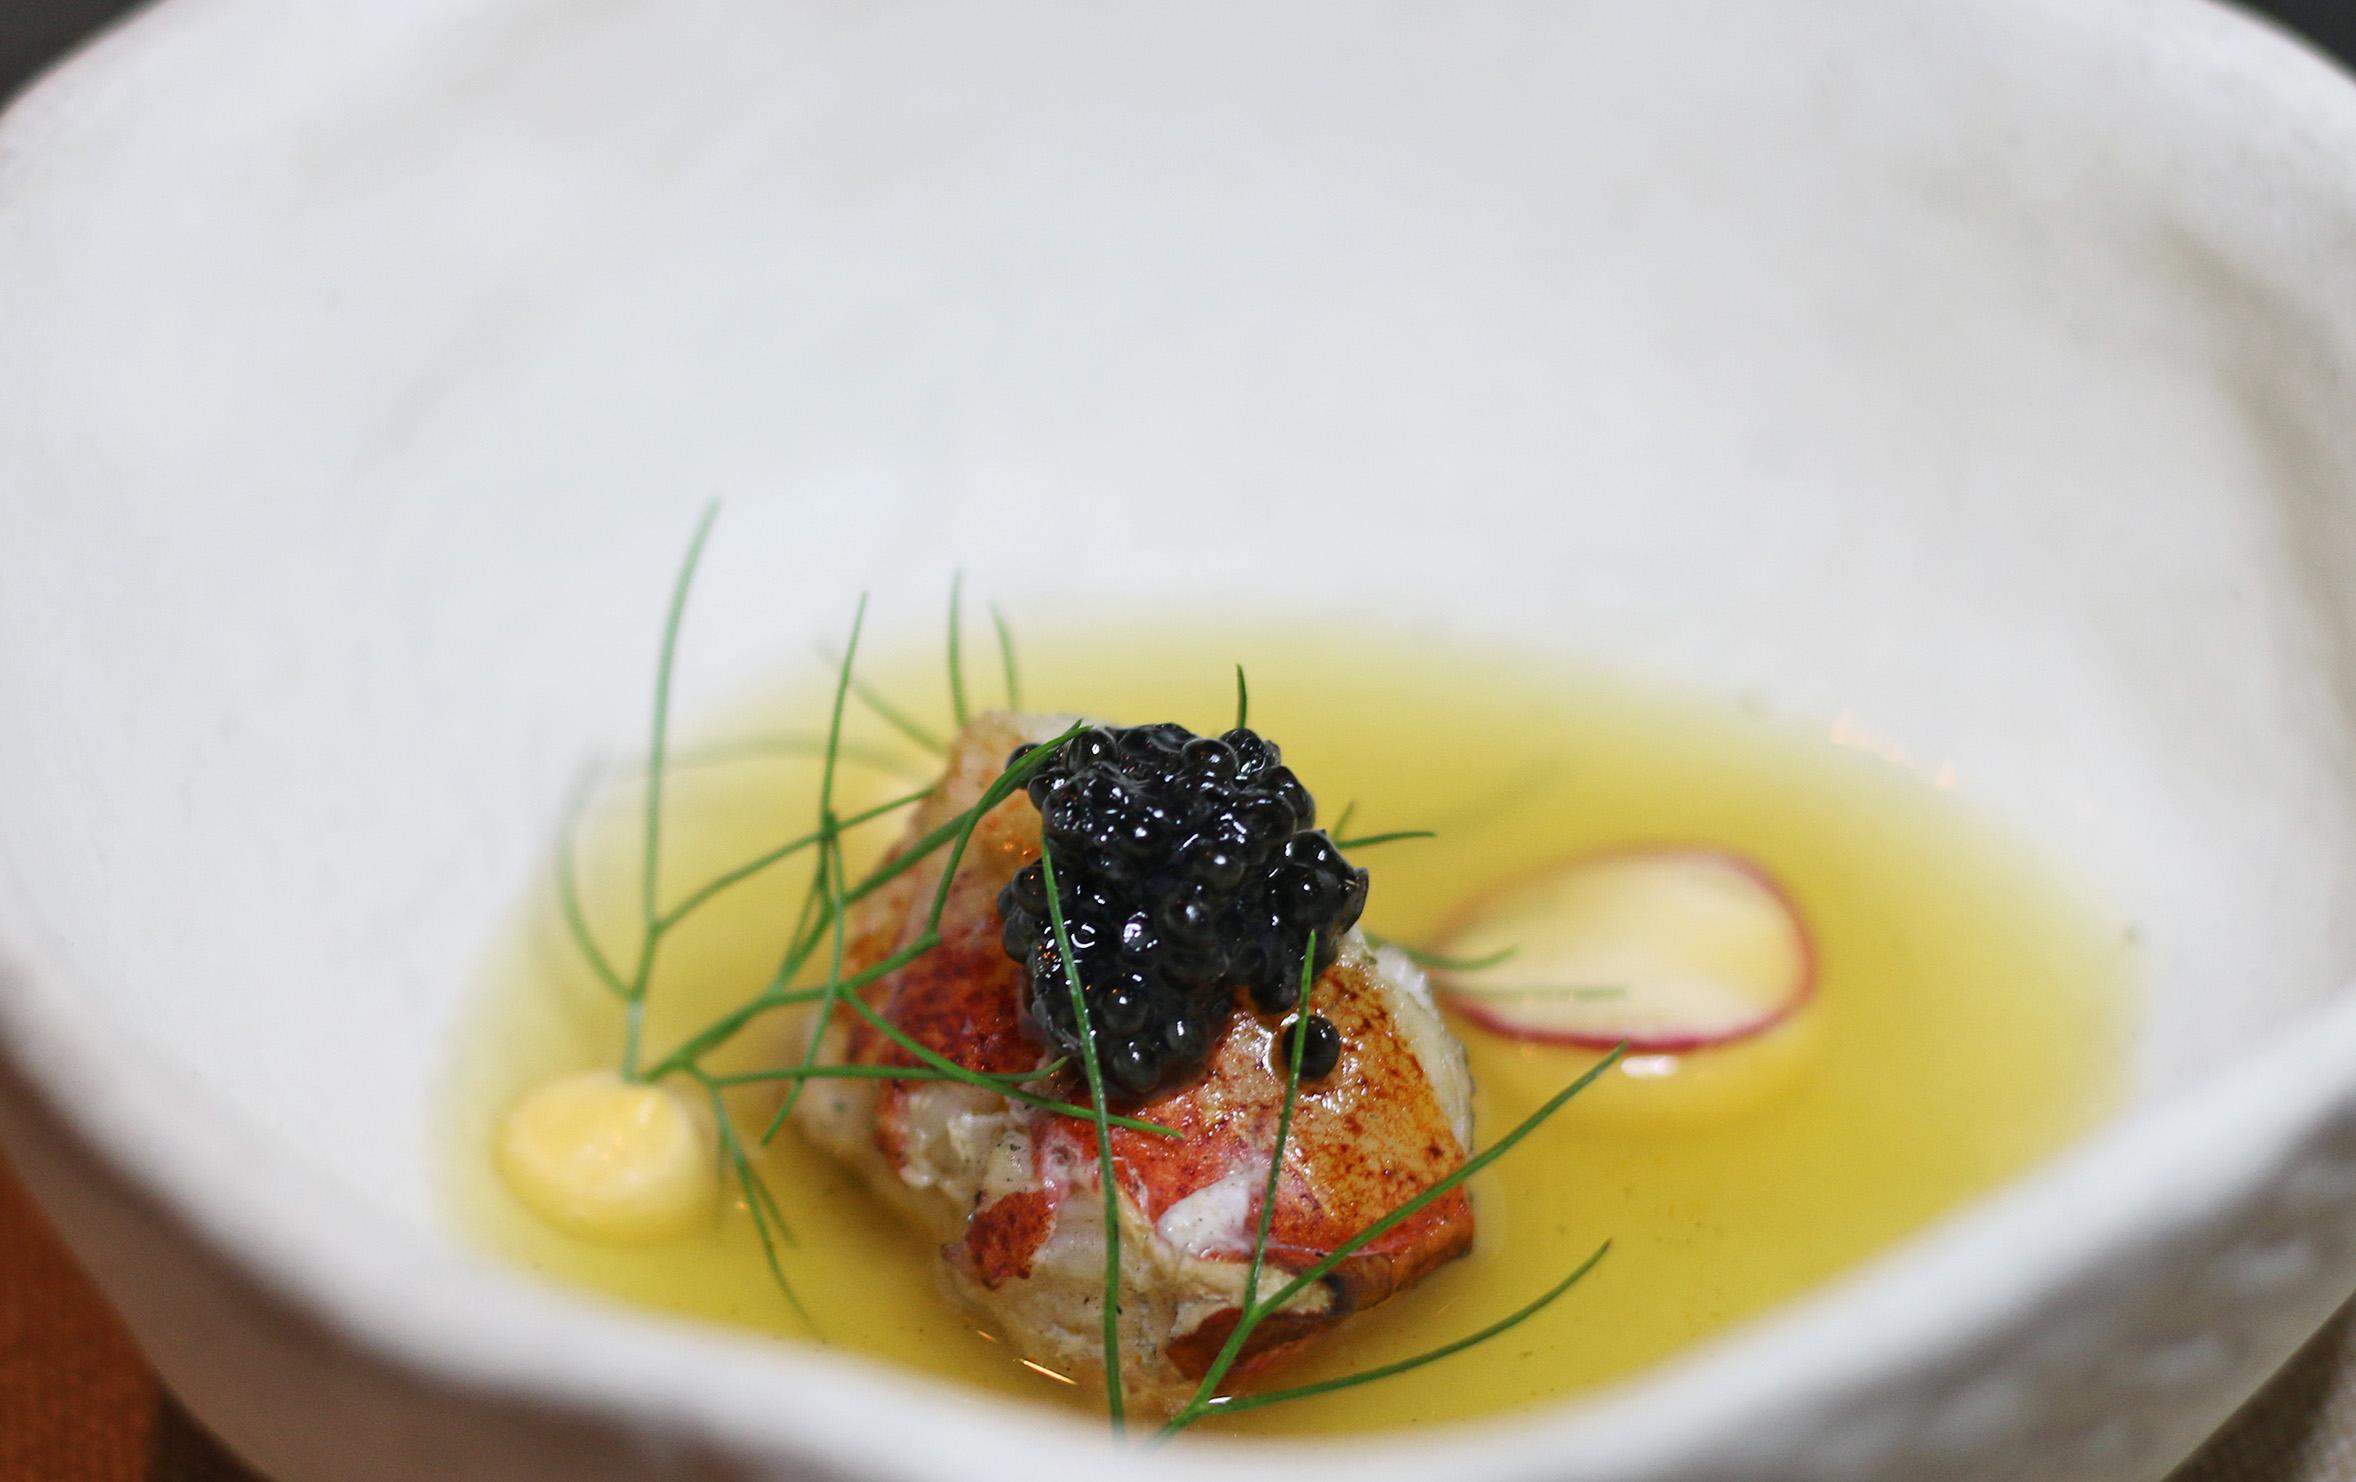 Maine Lobster Tail in a Sturgeon Caviar Bouillabaisse, w/a Paprika Aioli.